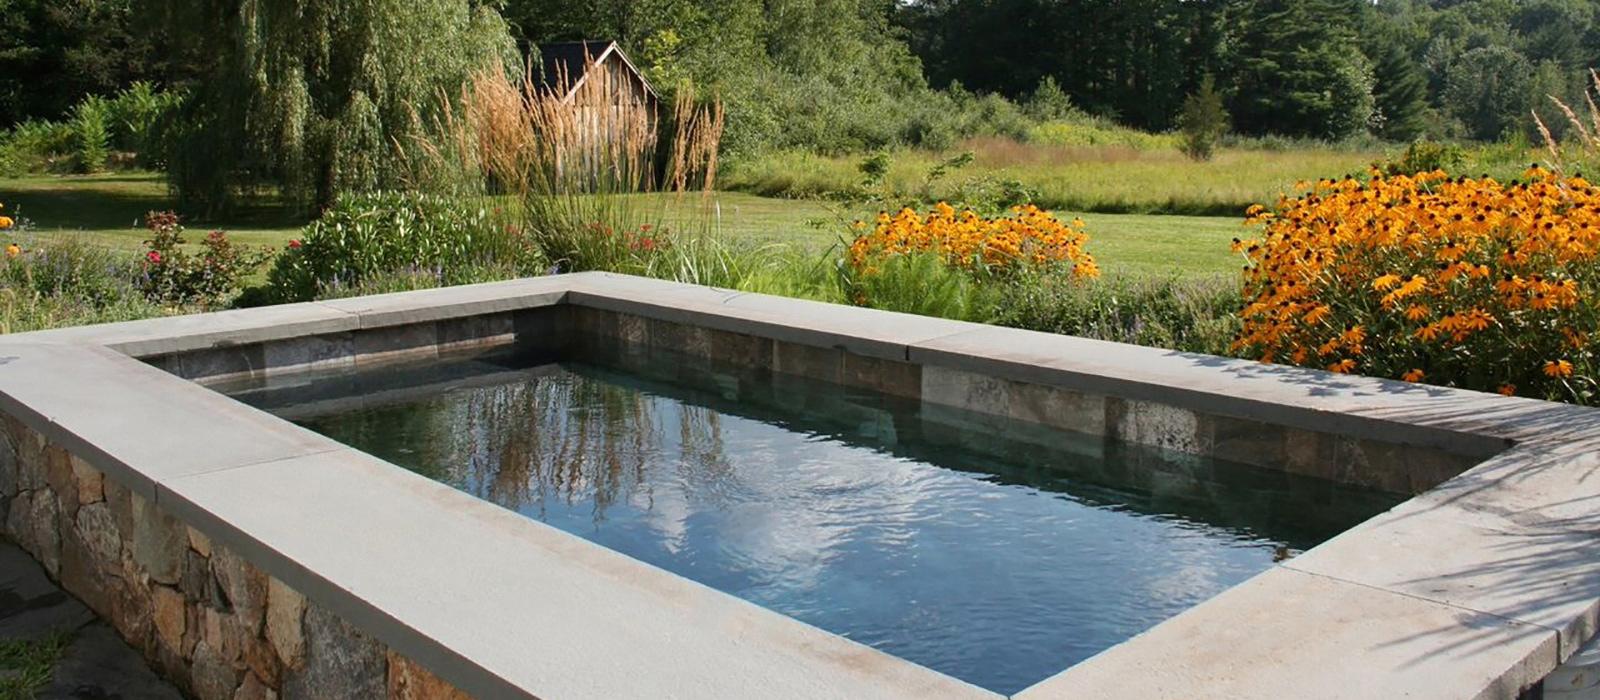 Soake Pools Small Pools Big Benefits